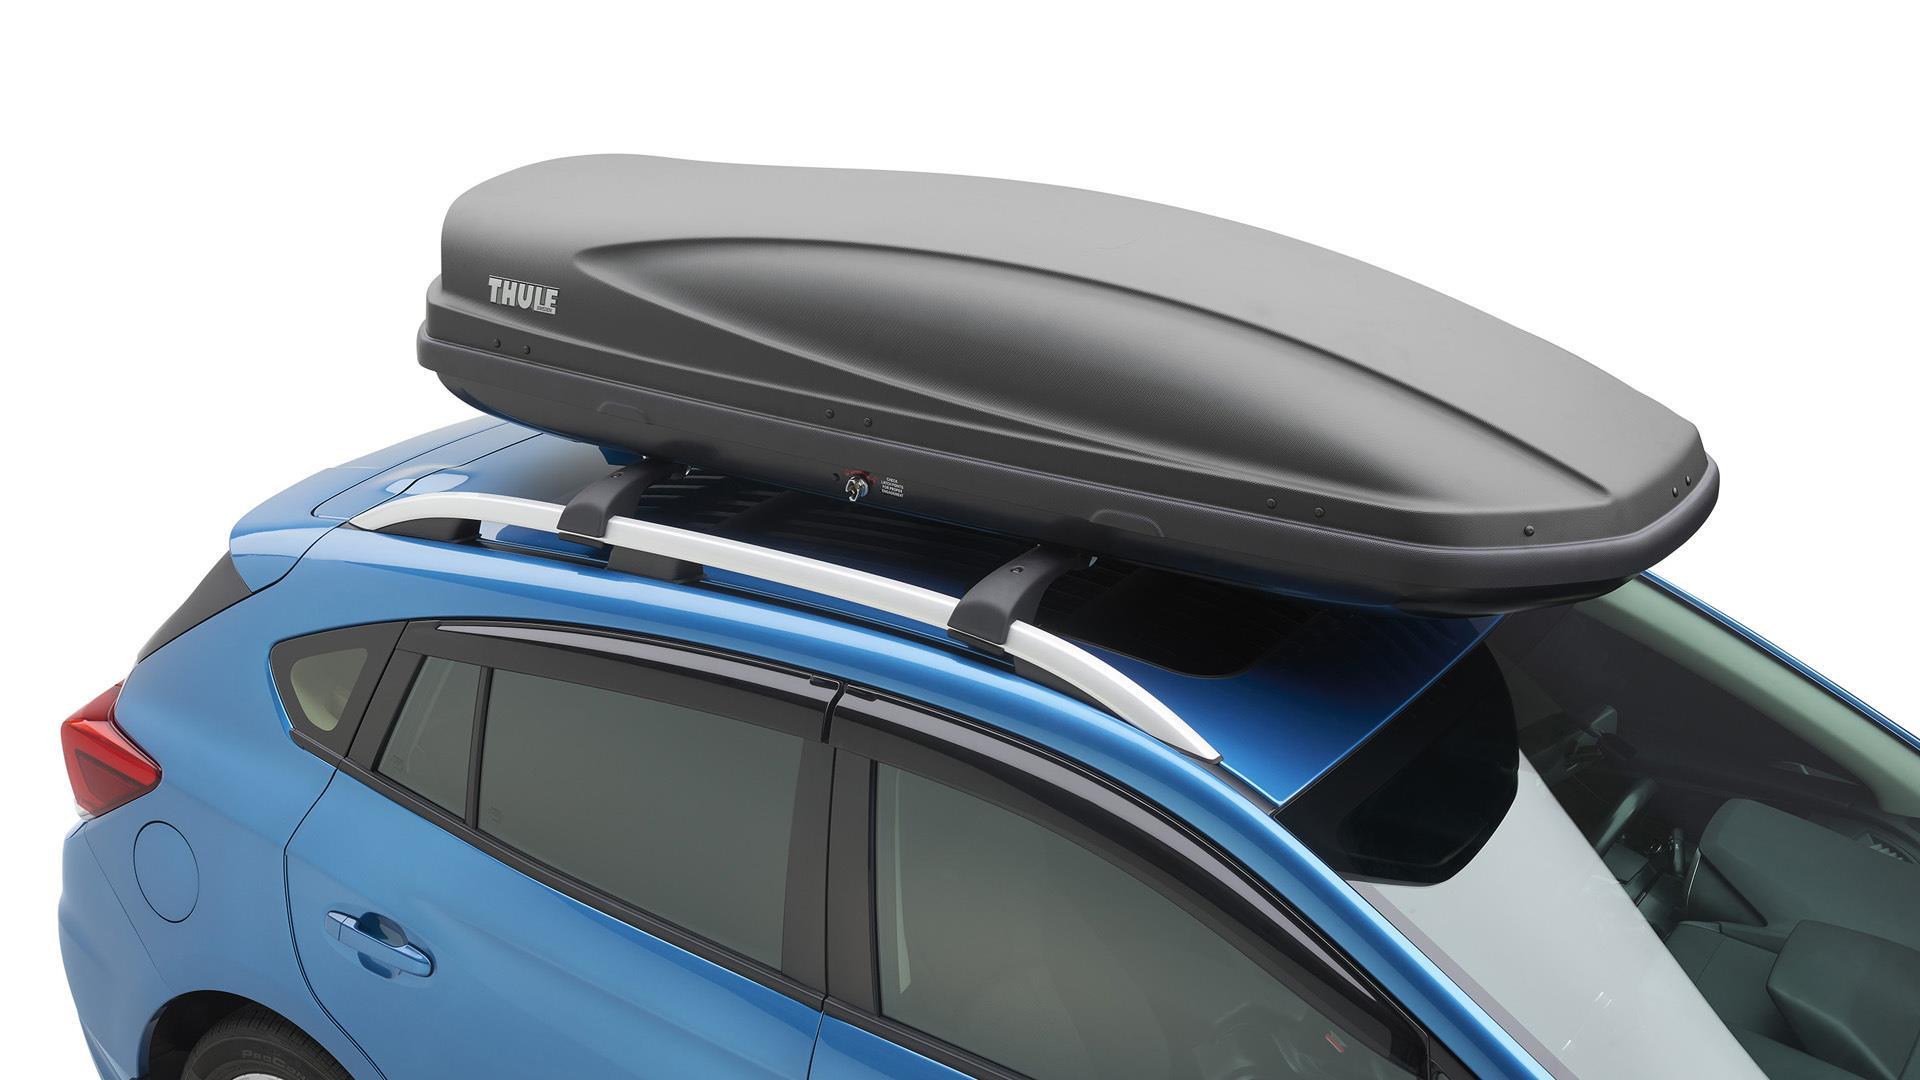 2017 subaru crosstrek thule roof cargo carrier extended. Black Bedroom Furniture Sets. Home Design Ideas